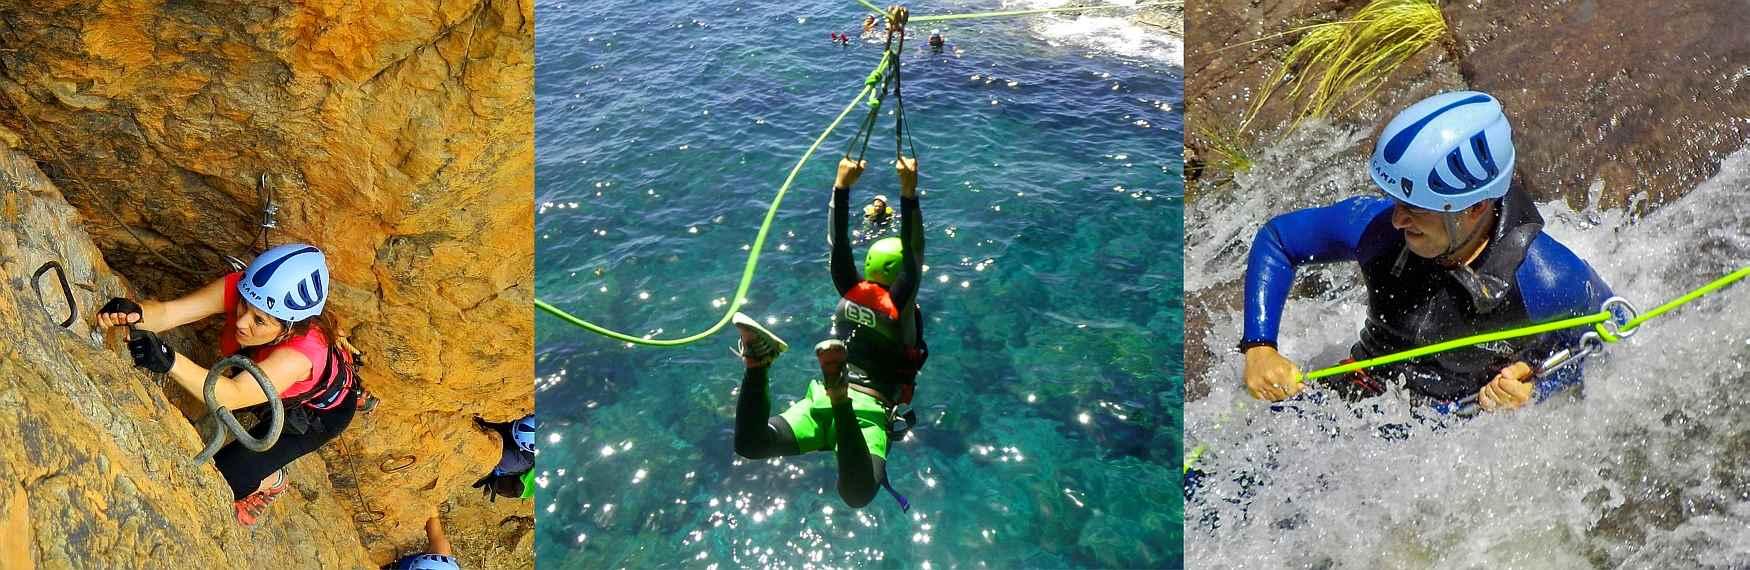 Gran Canaria Climbing - Via Ferrata - Canyoning - Coasteering